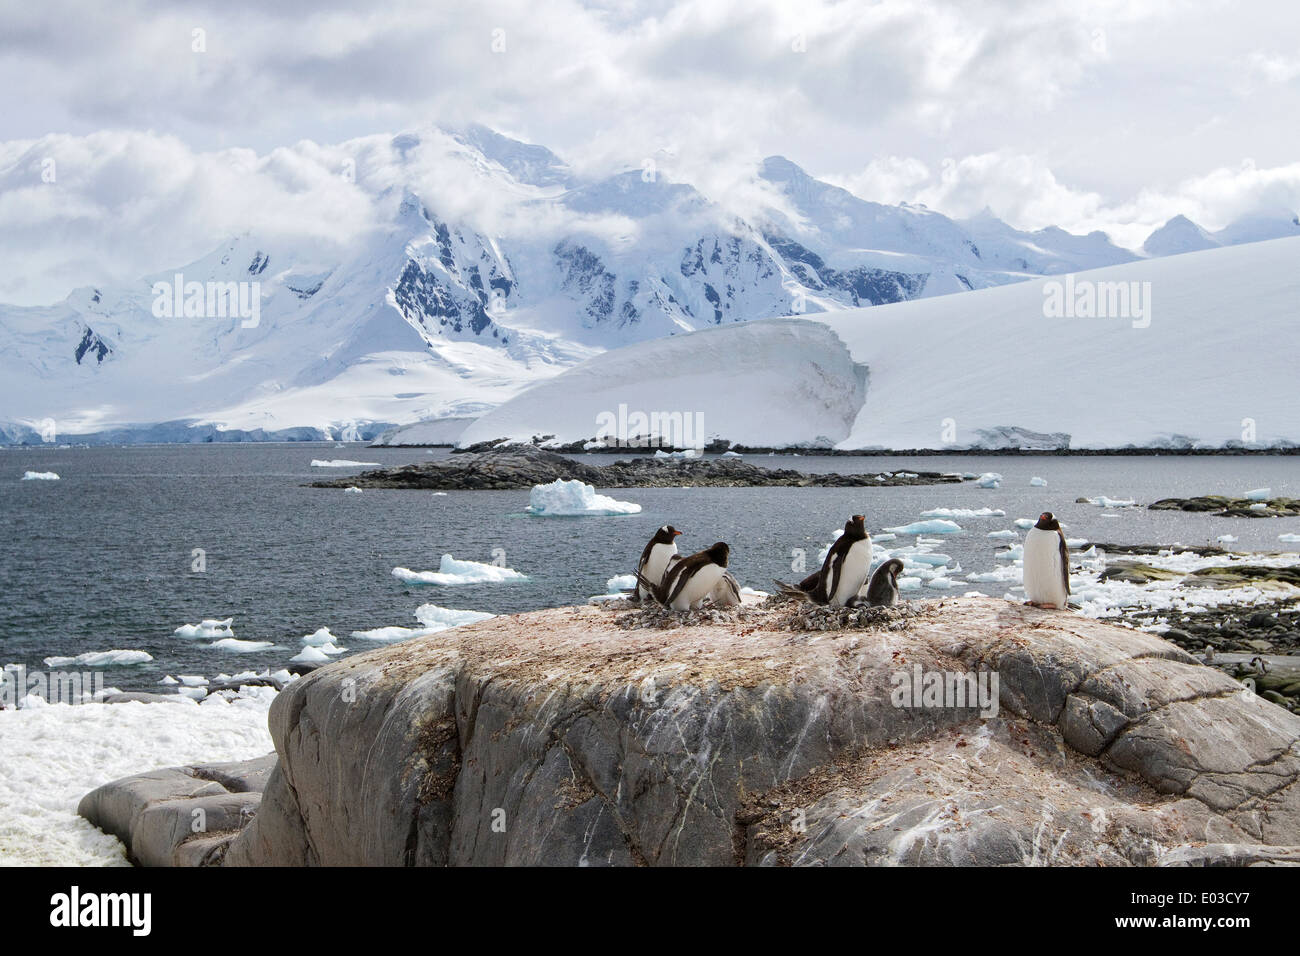 Antarctica, Gentoo penguins, Pygoscelis papua, nesting at Port Lockroy, Antarctic Peninsula with mountain and glacier landscape. - Stock Image